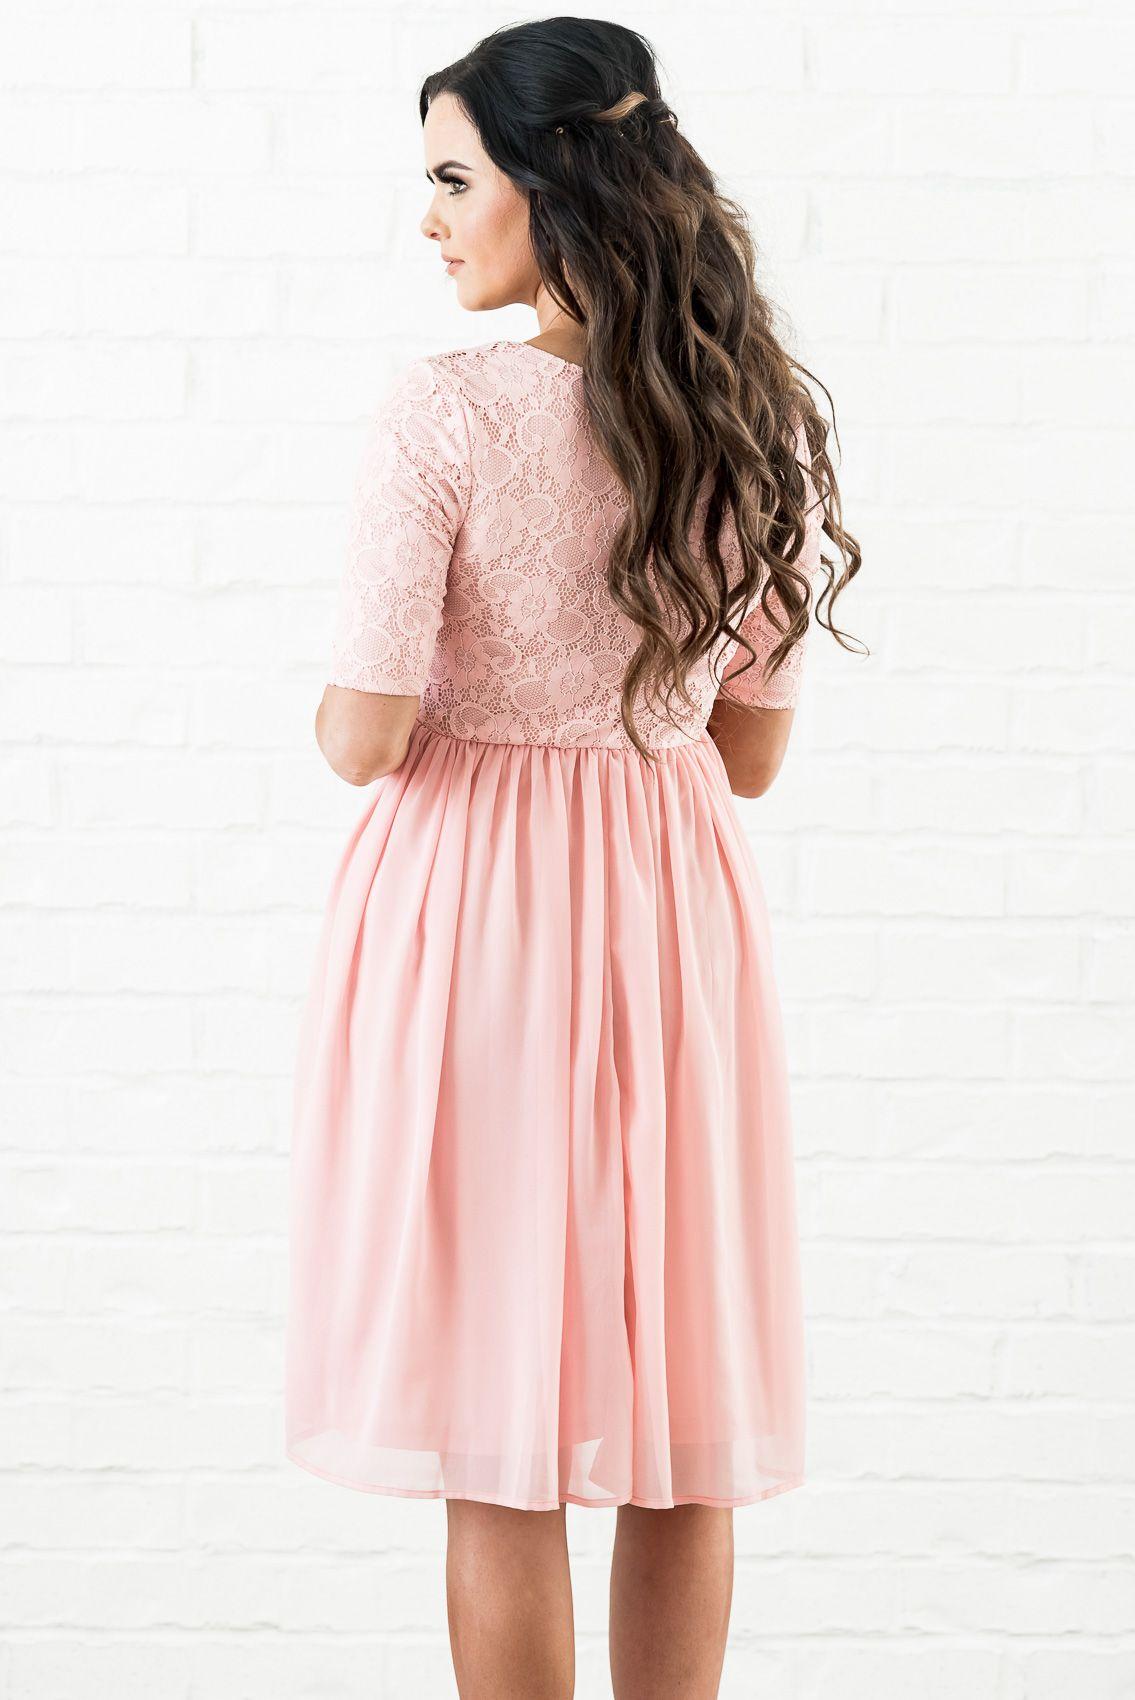 c74485f0e13 Erica (or Erika) Modest Dress or Bridesmaid Dress in Blush Pink Lace    Chiffon 59.99